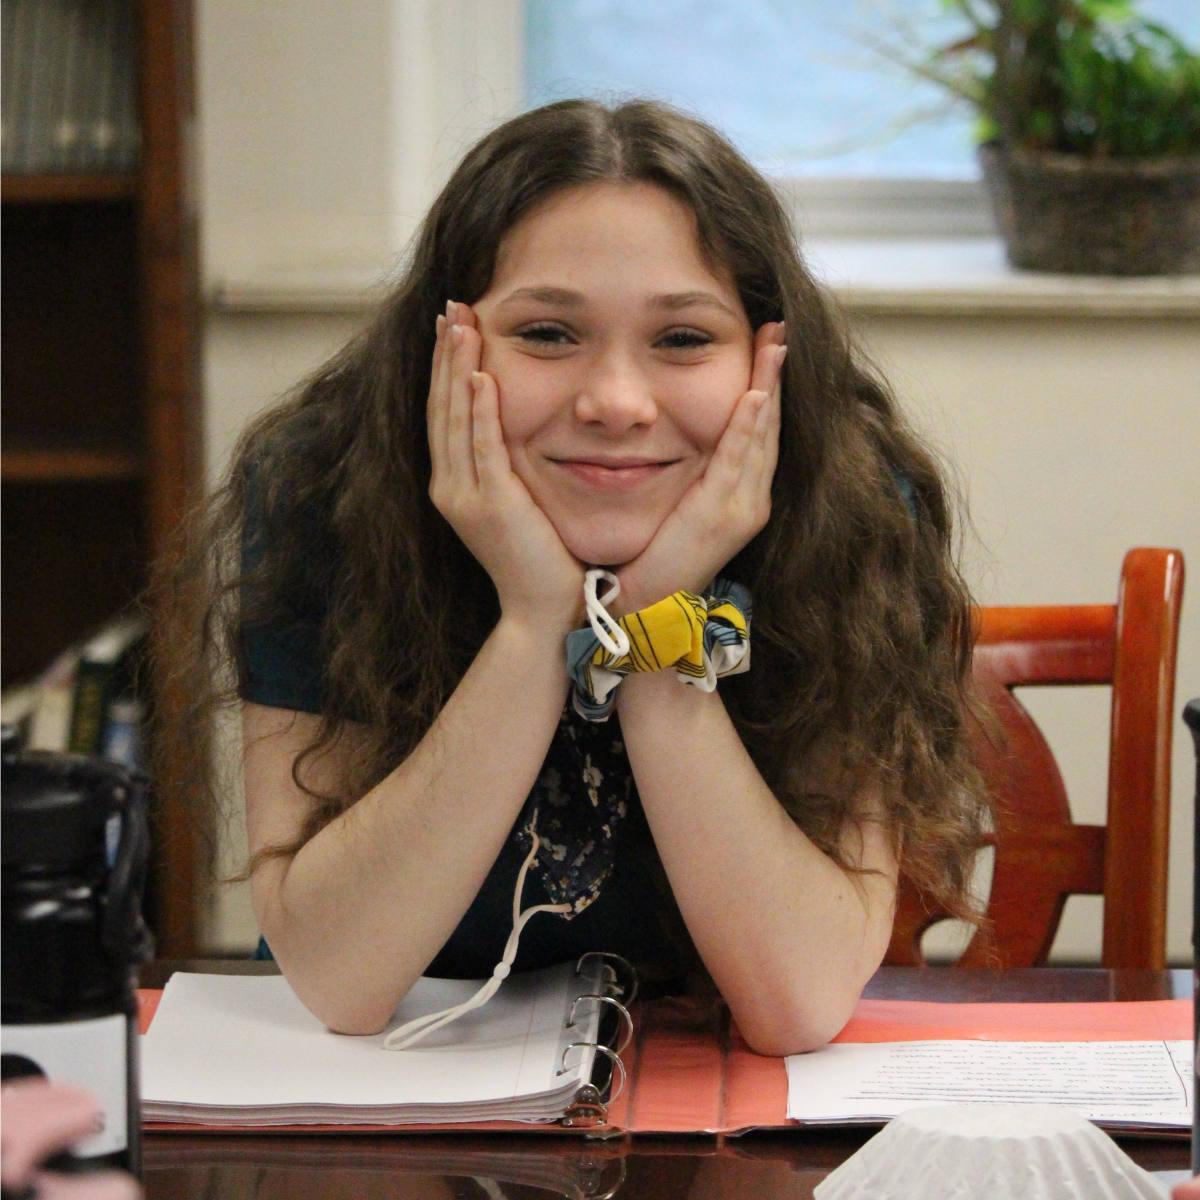 MVCS Smiling Student